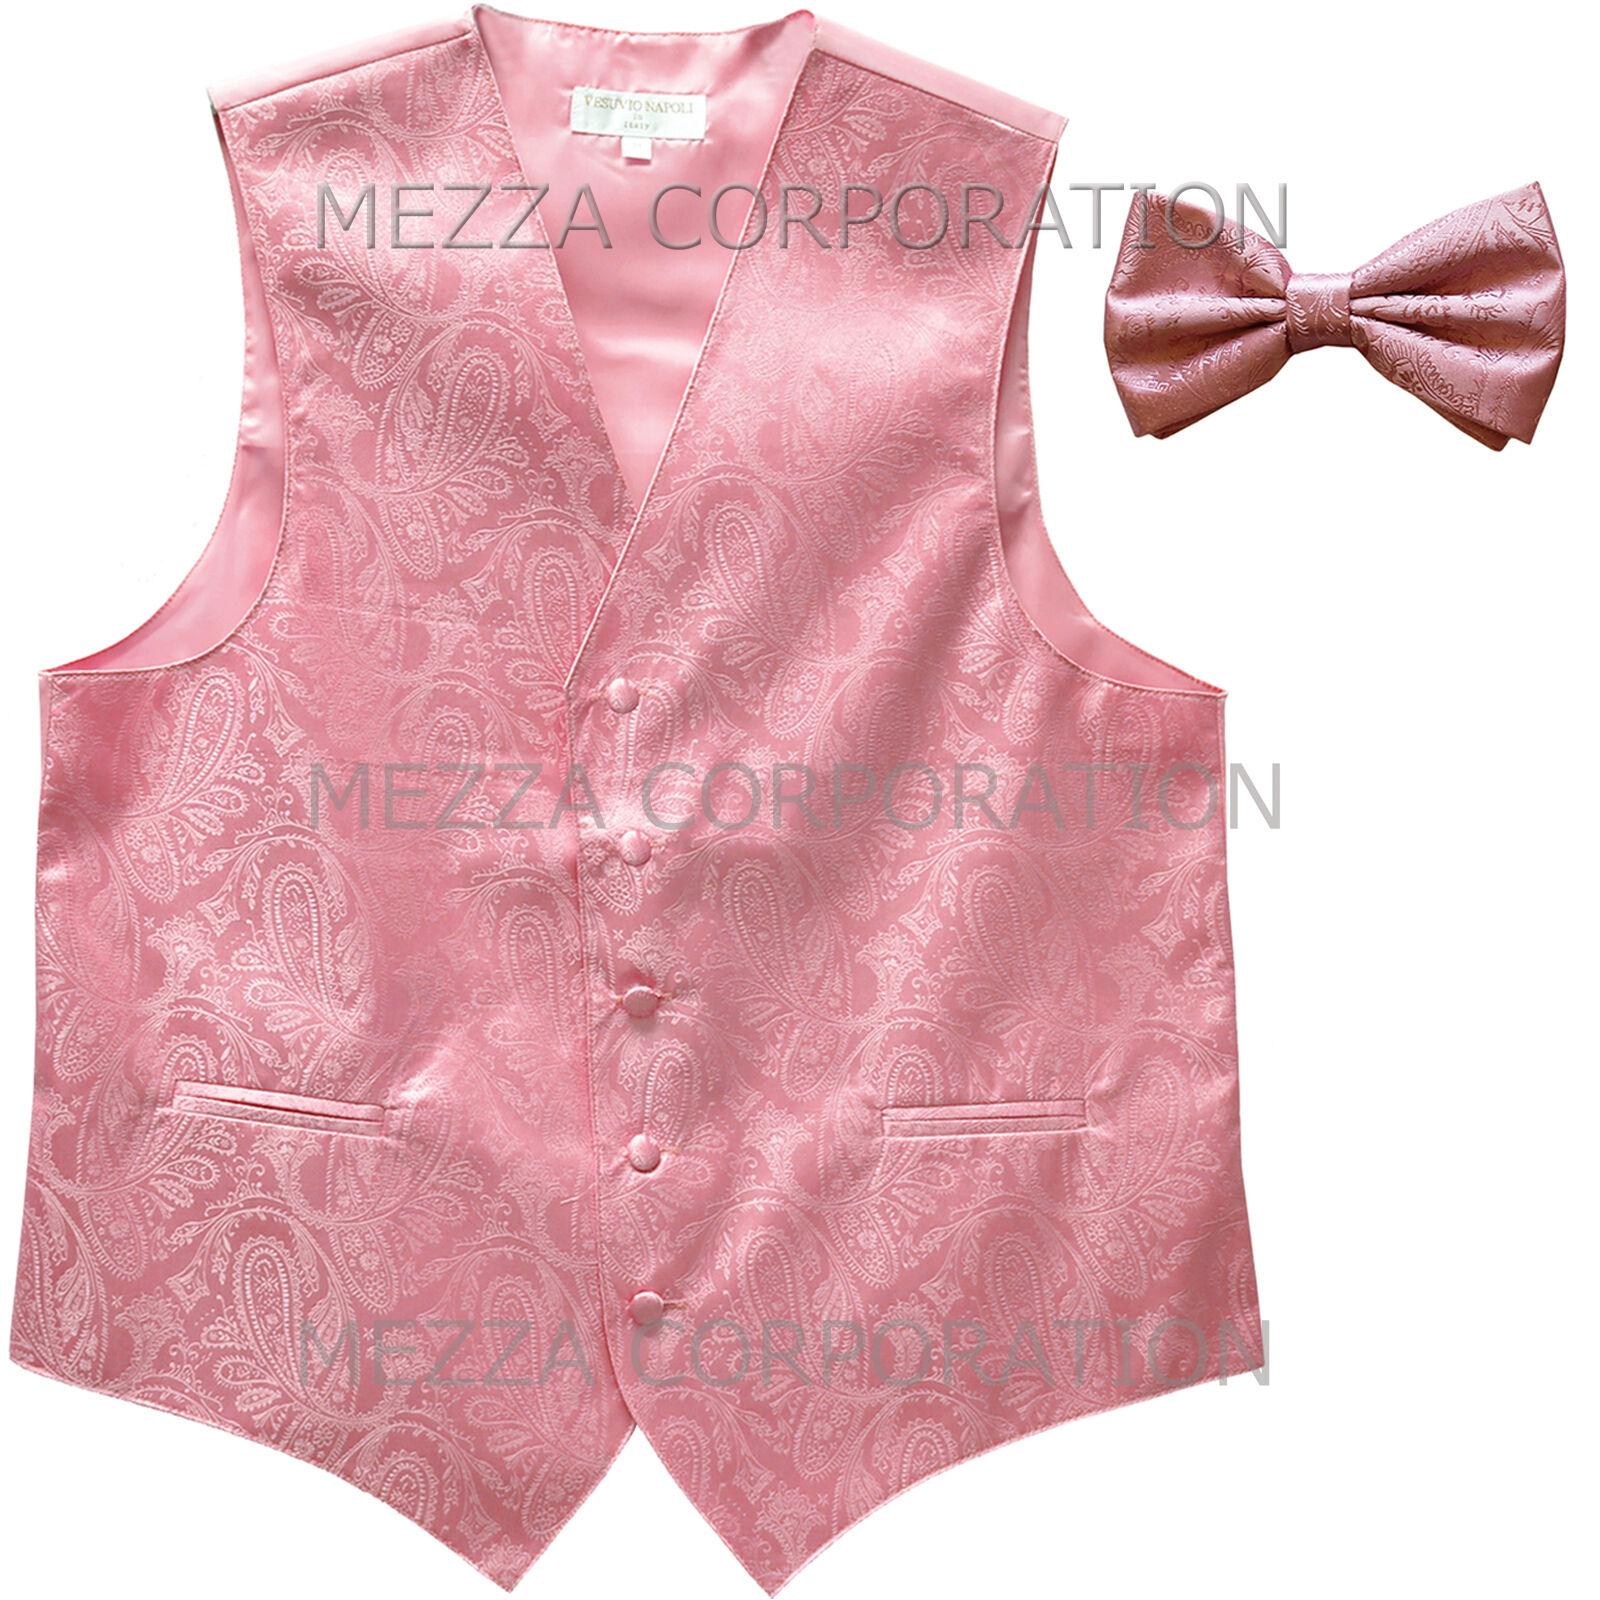 New Vesuvio Napoli Men's paisley formal Tuxedo Vest Waistcoat_Bowtie Pink